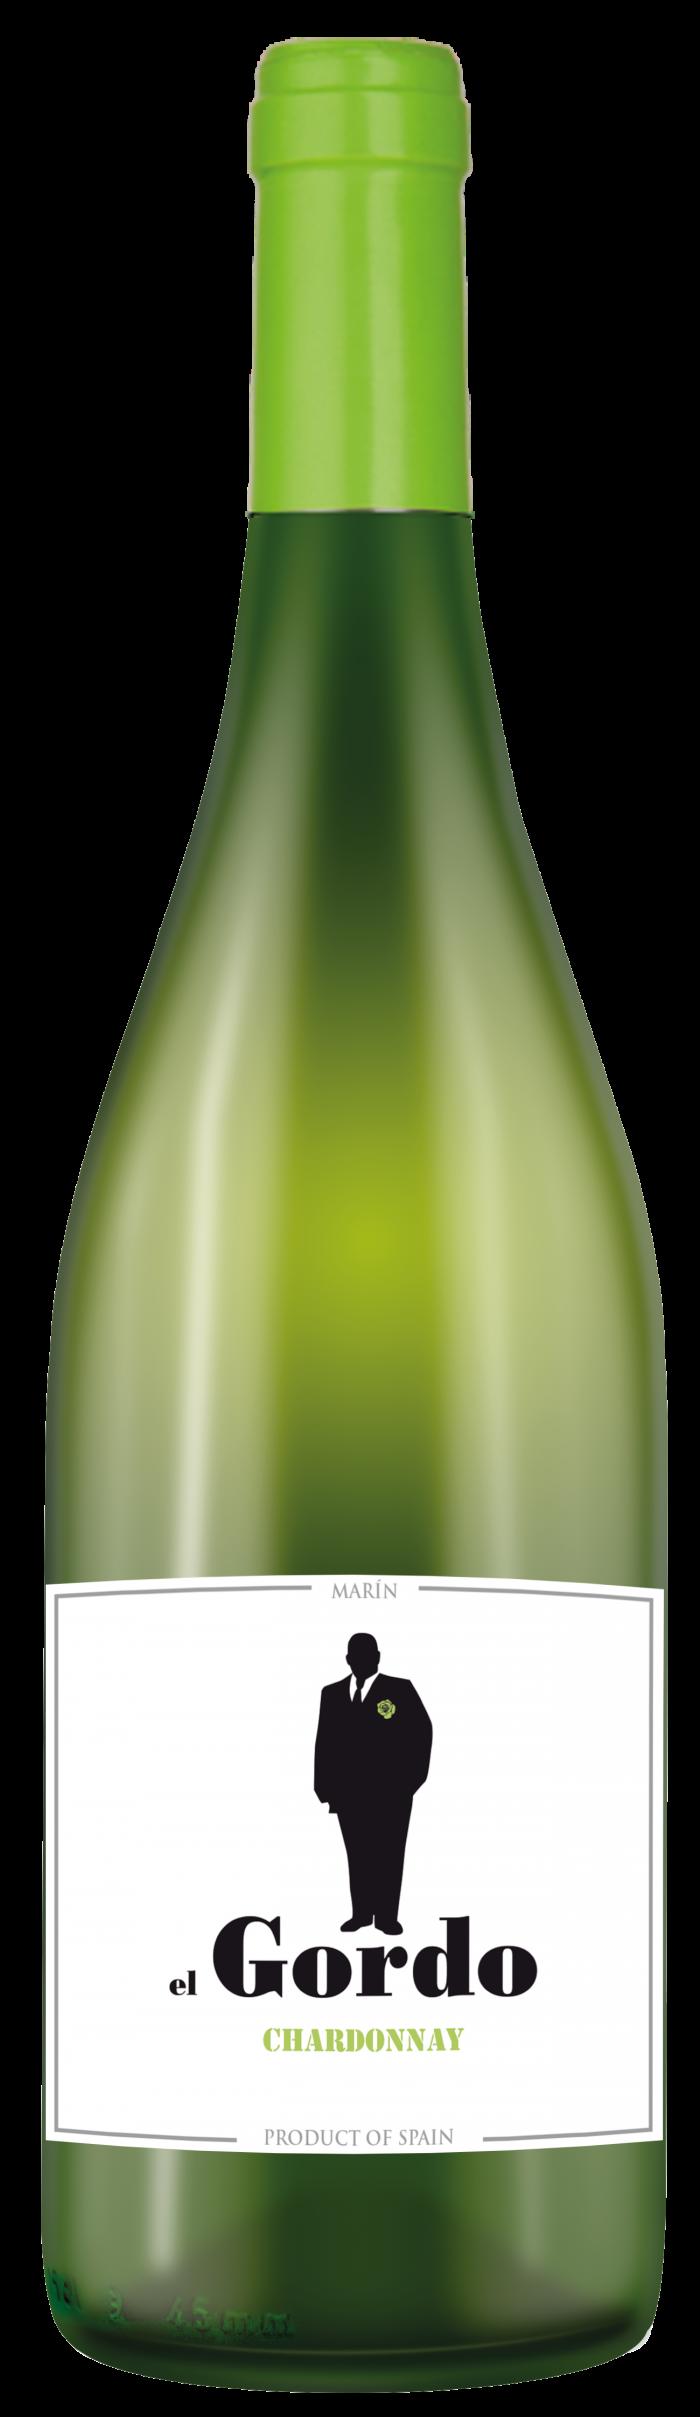 El Gordo Chardonnay Cariñena   Spanje   gemaakt van de druif: Chardonnay